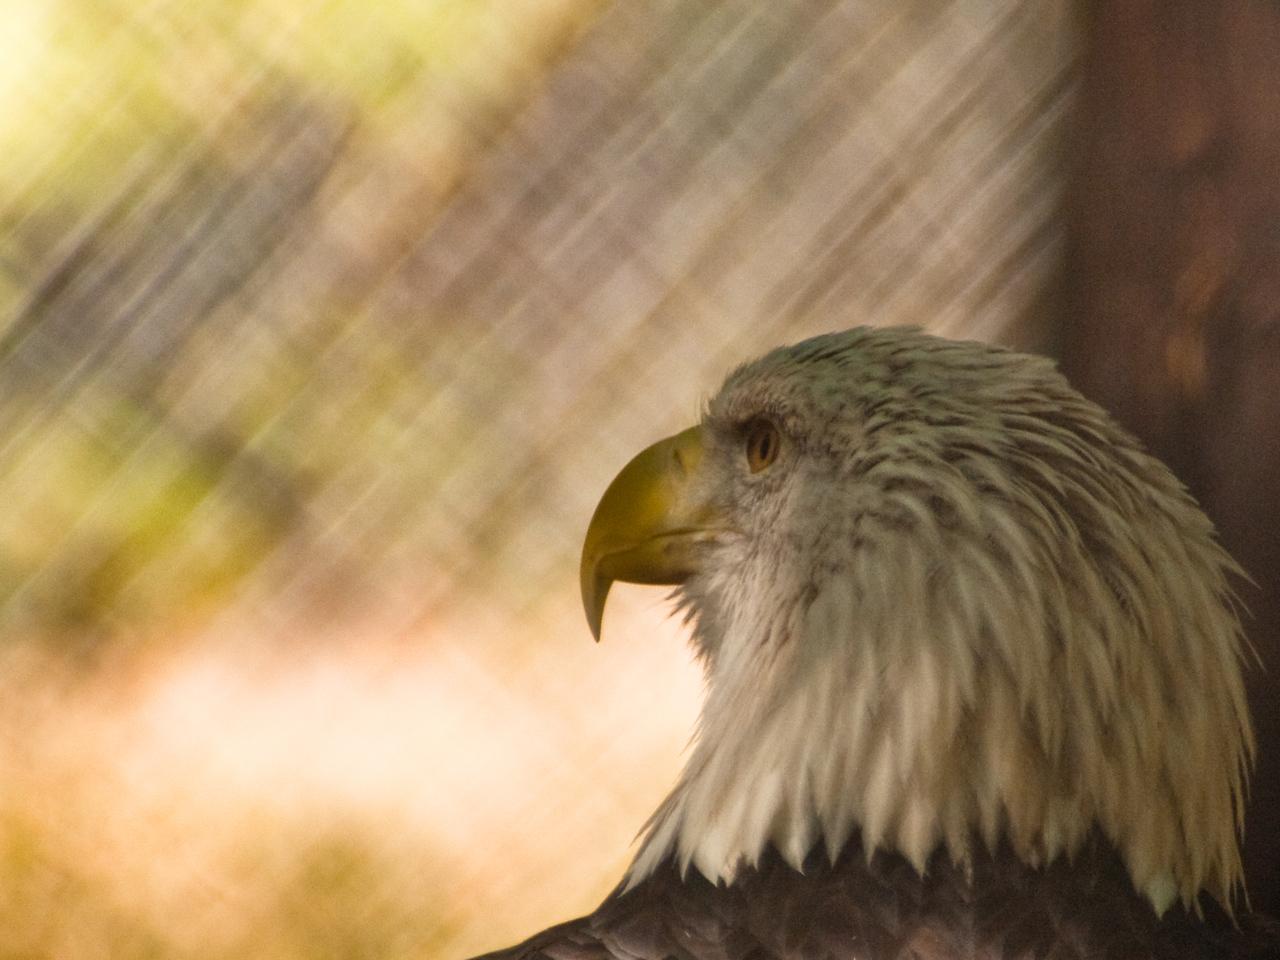 Raptors, Charlotte, Carolina Raptor Center, Hawks, Owls, Birds of Prey